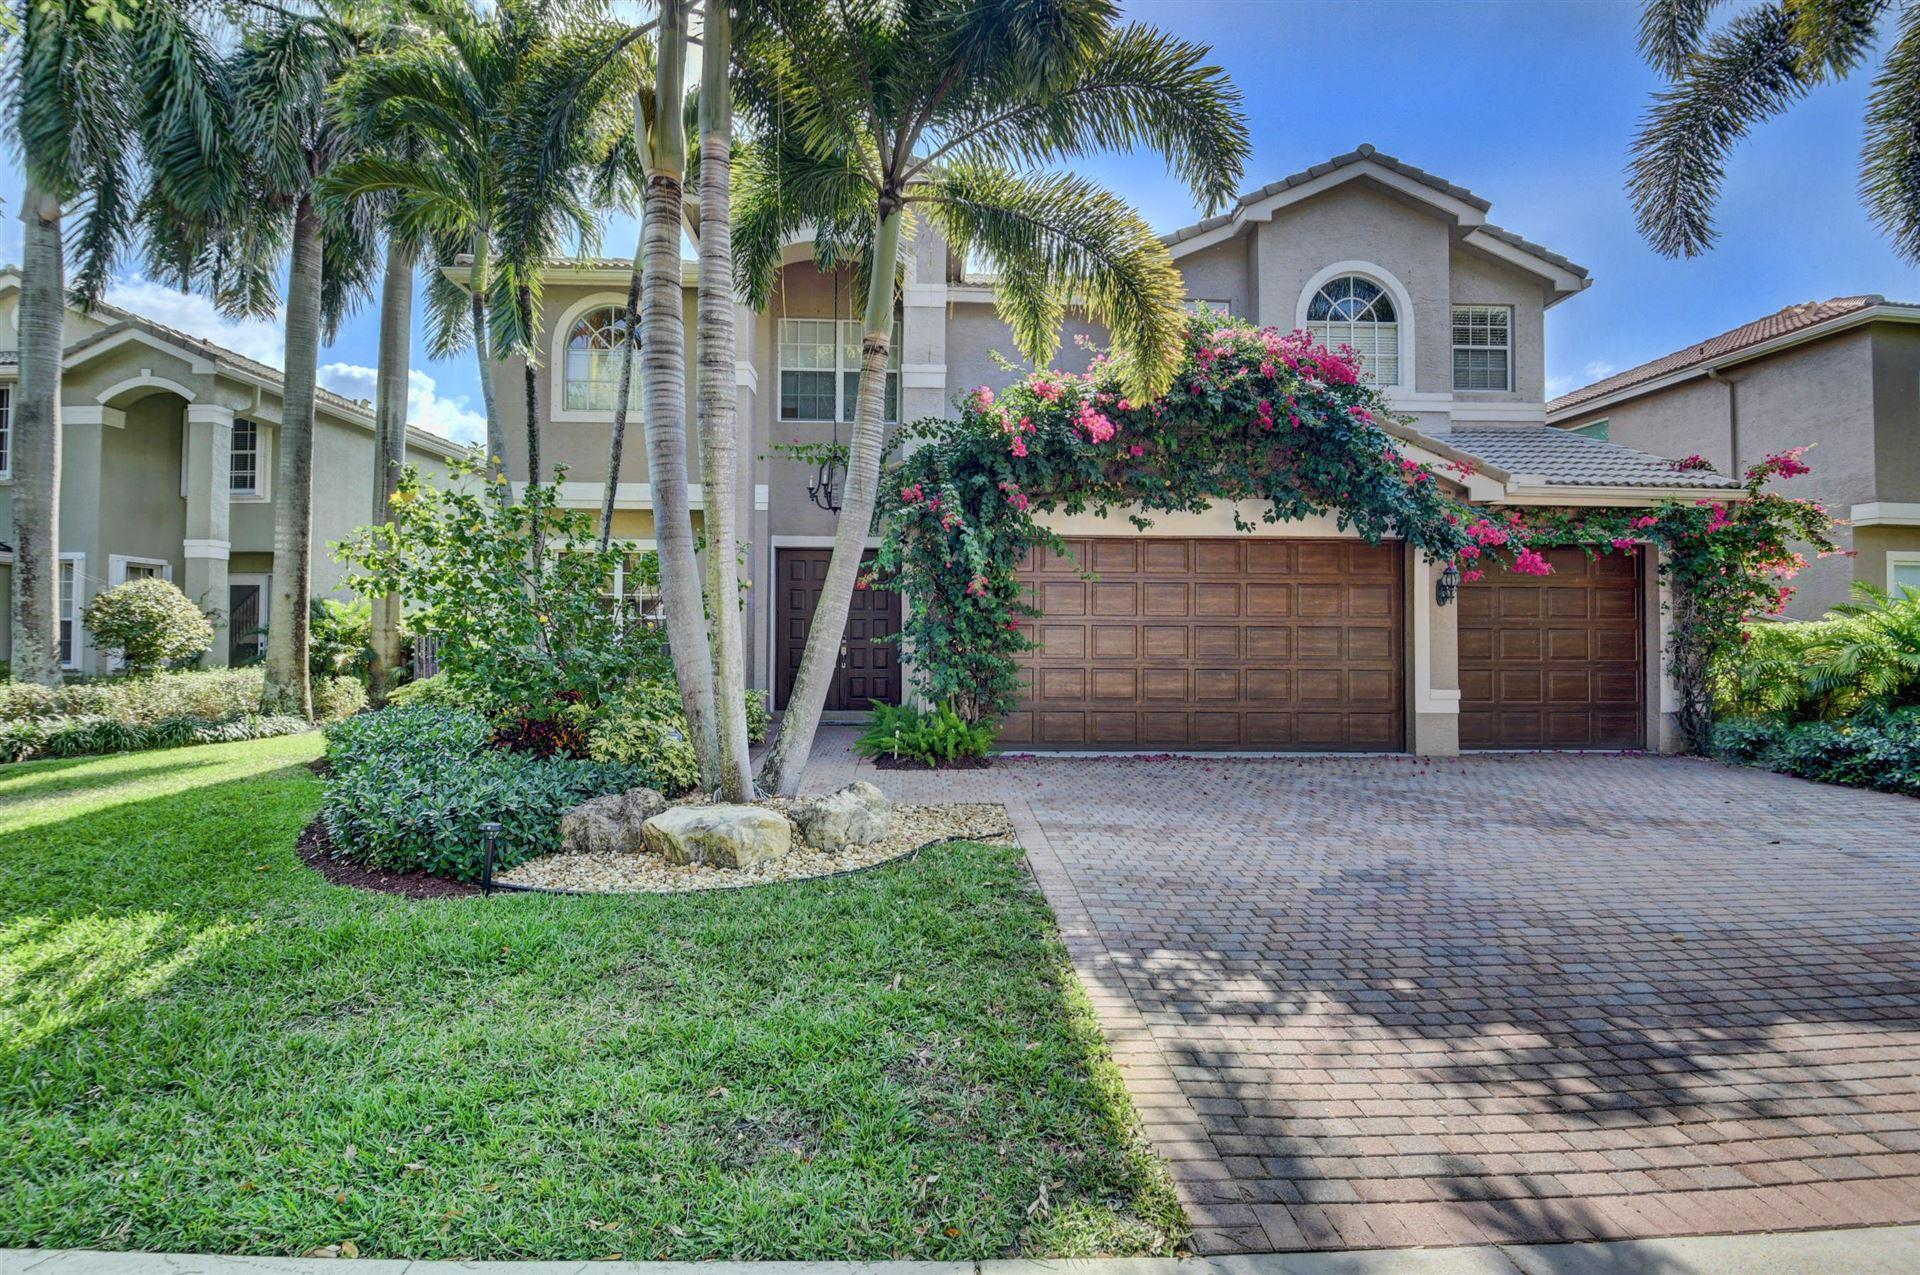 15986 Mataro Bay Court, Delray Beach, FL 33446 - MLS#: RX-10707865